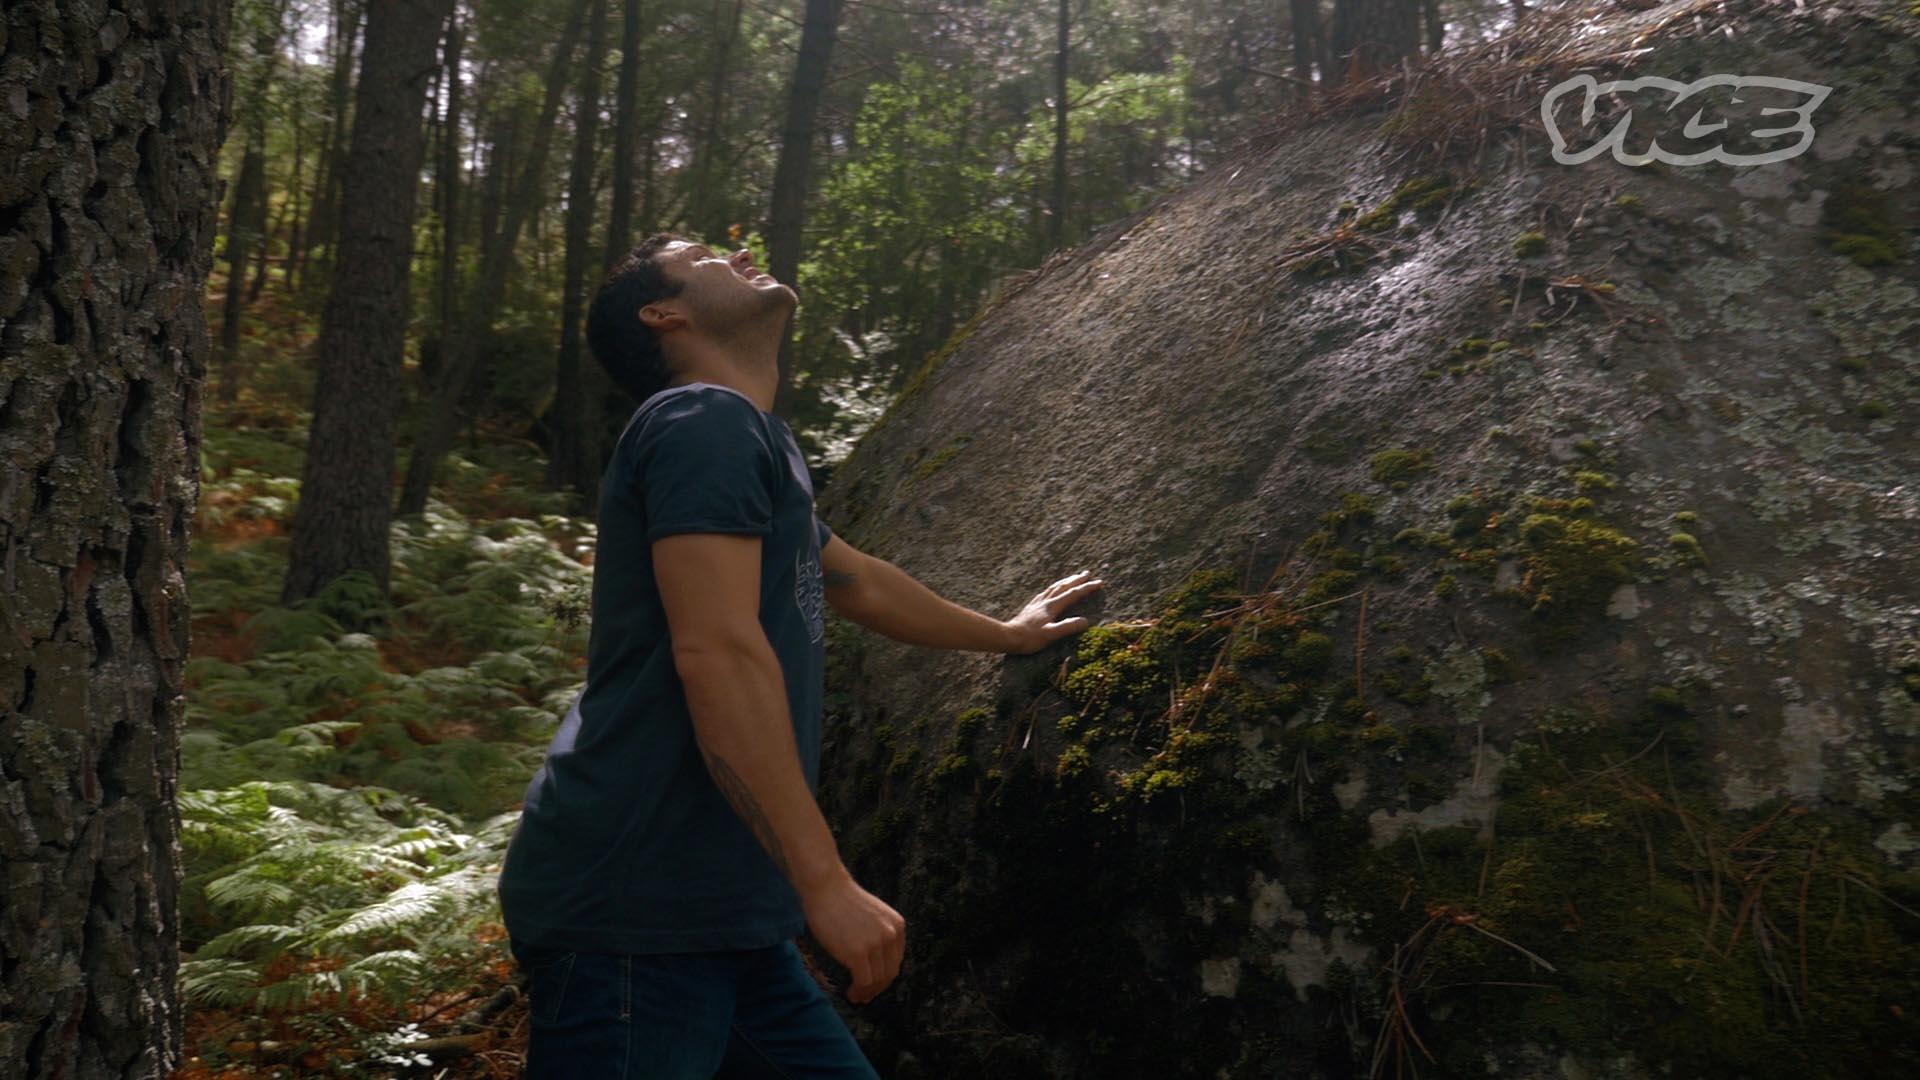 STILL-Mosca-forest